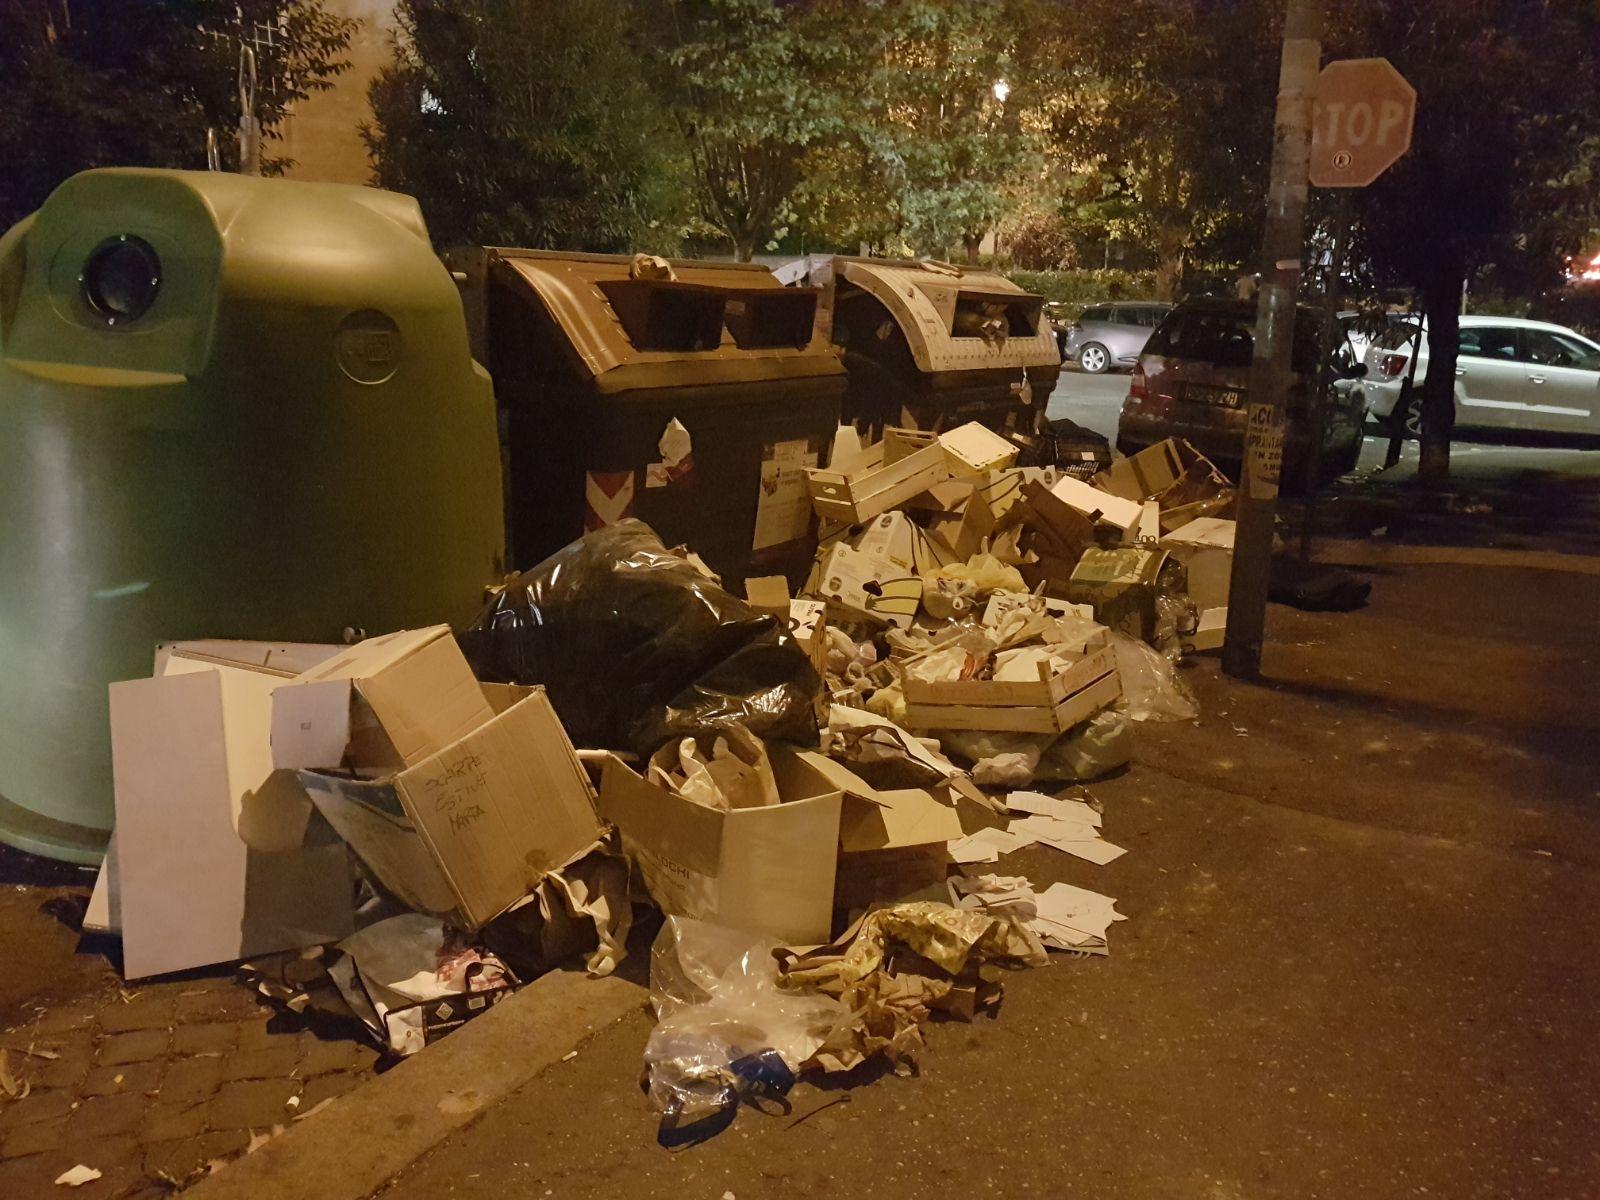 montagne di rifiuti roma